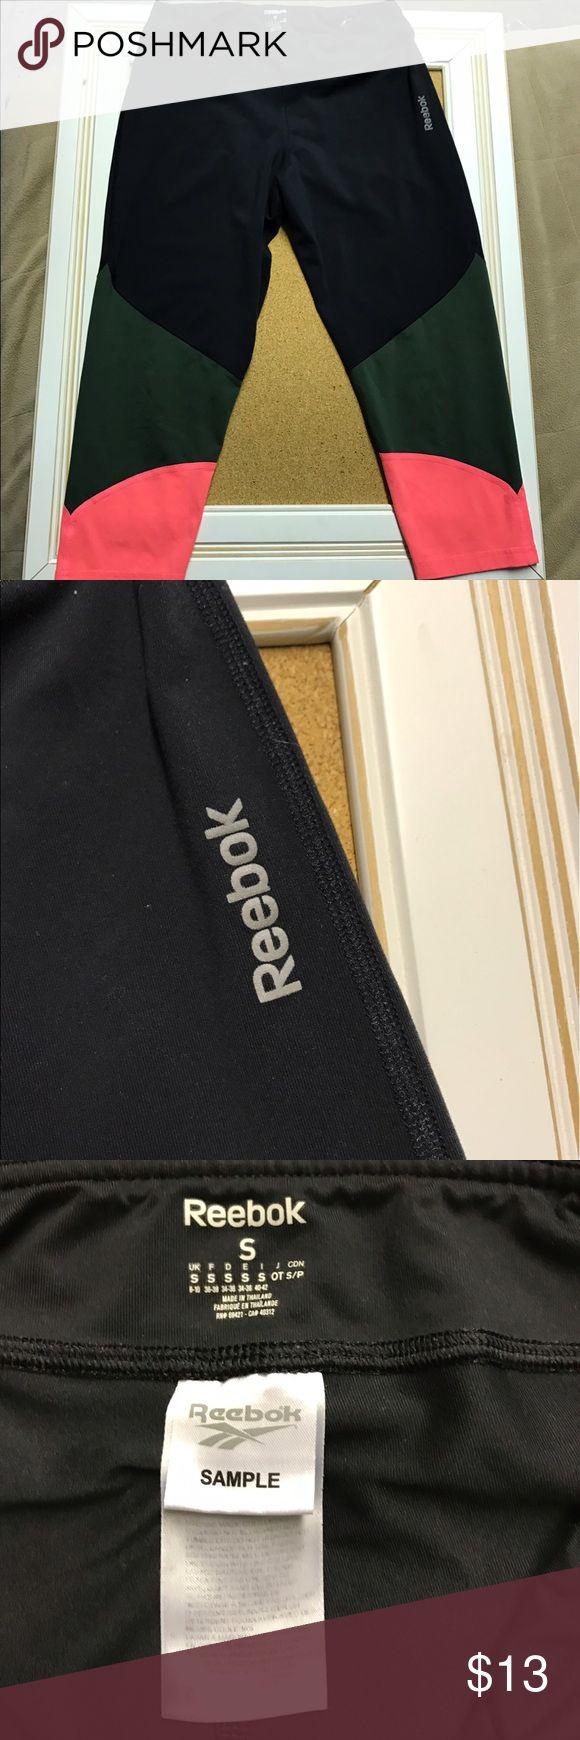 Reebok Capri shorts ***USED*** Reebok Running Capri shorts Reebok Shorts